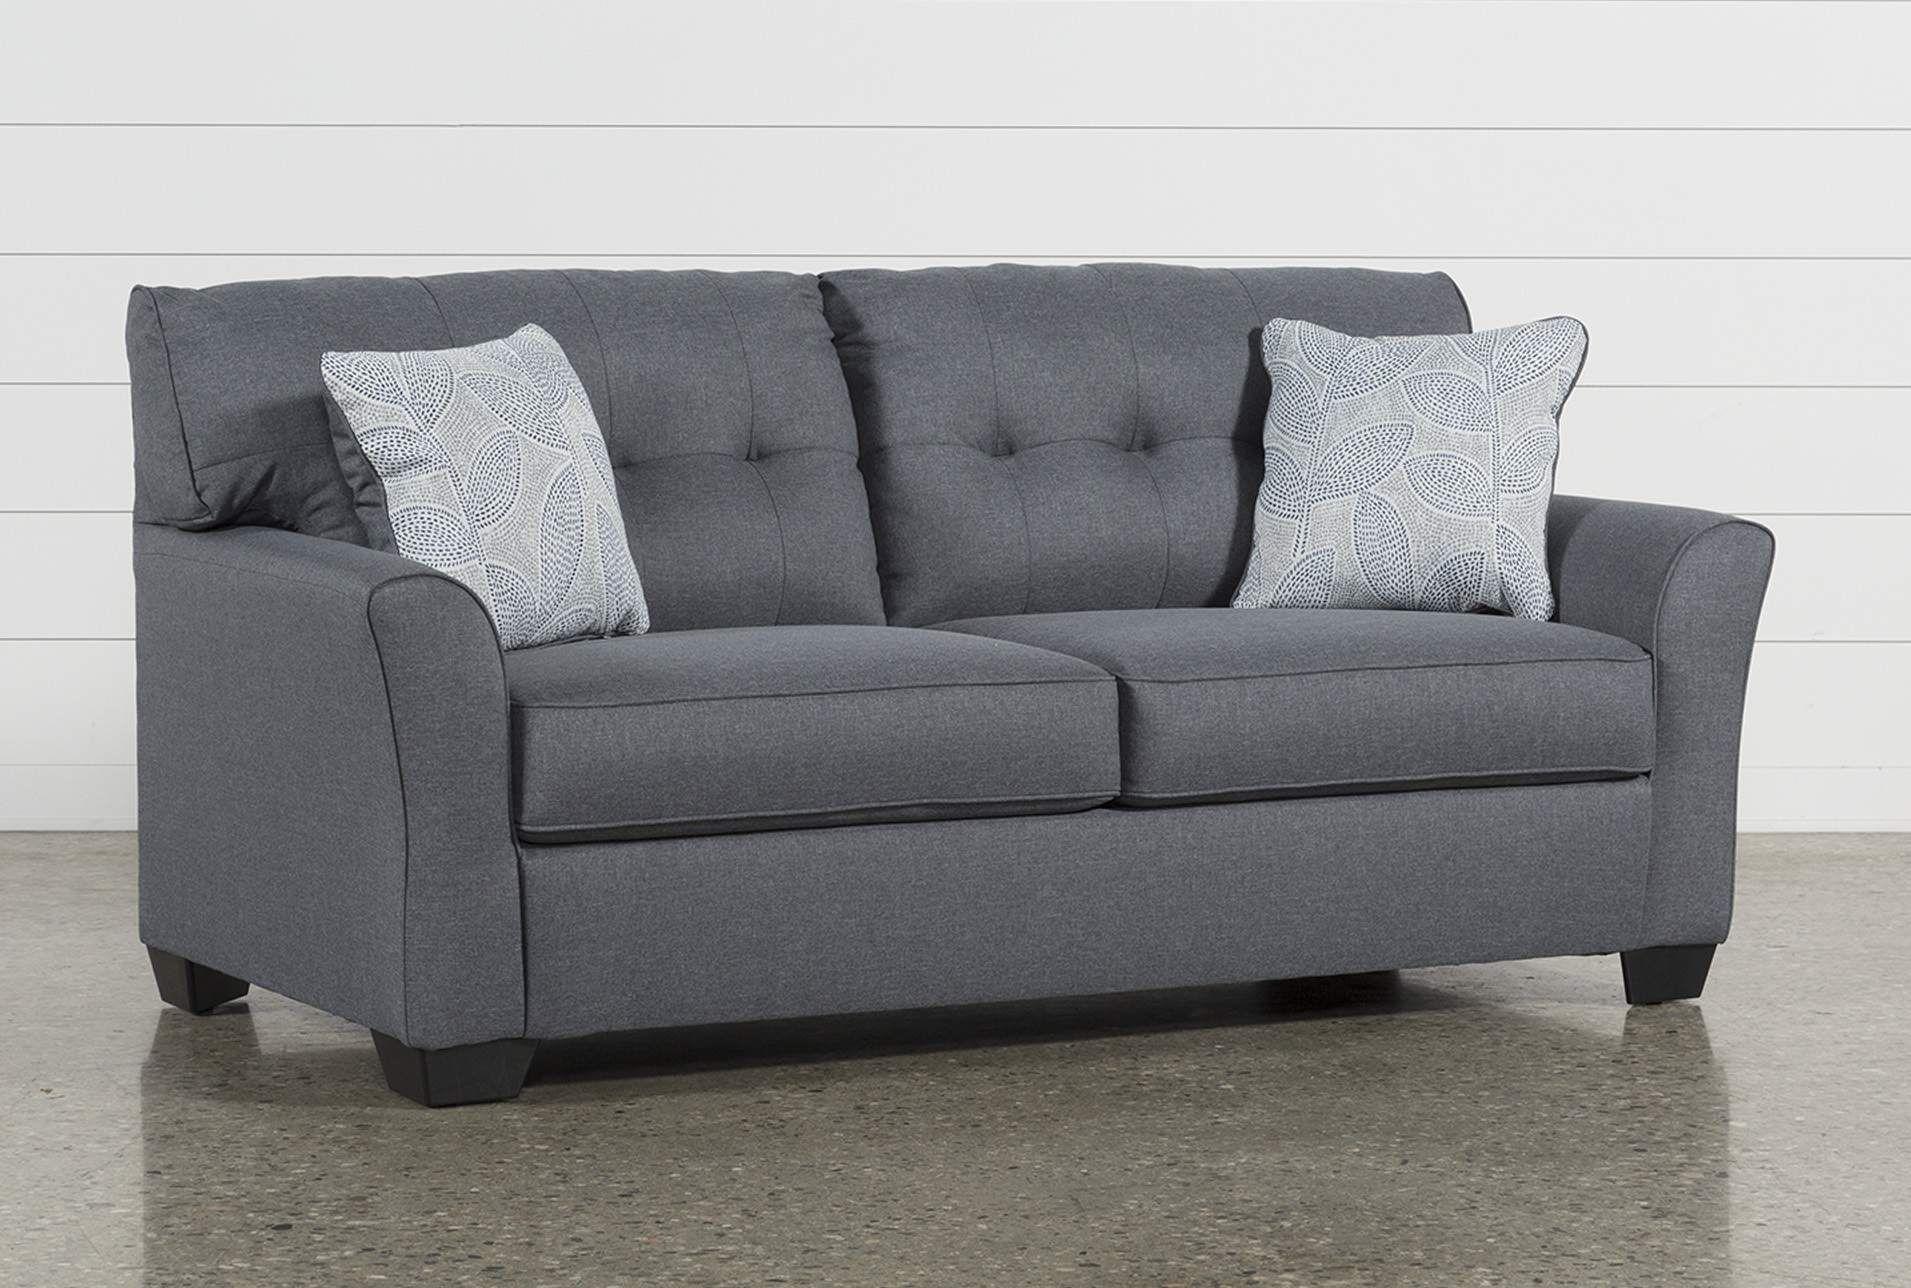 Enjoy The Comfort Of Loveseat Sleeper 3 Piece Living Room Set Full Size Sofa Bed Sofa